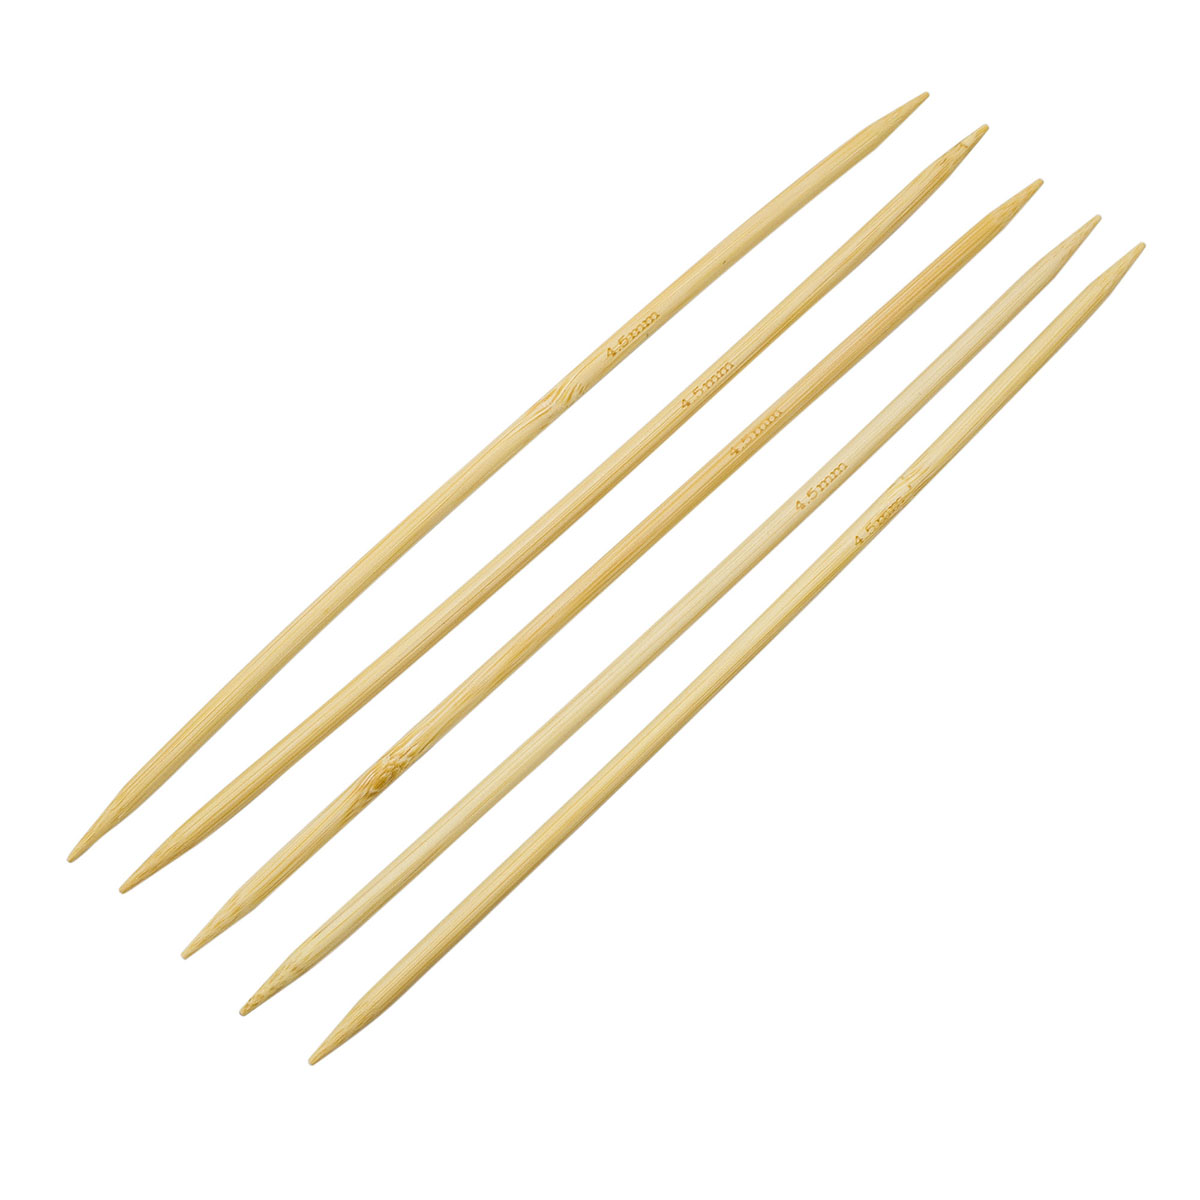 Спицы носочные бамбук 942545, 20 см, 4,5 мм, Hobby&Pro